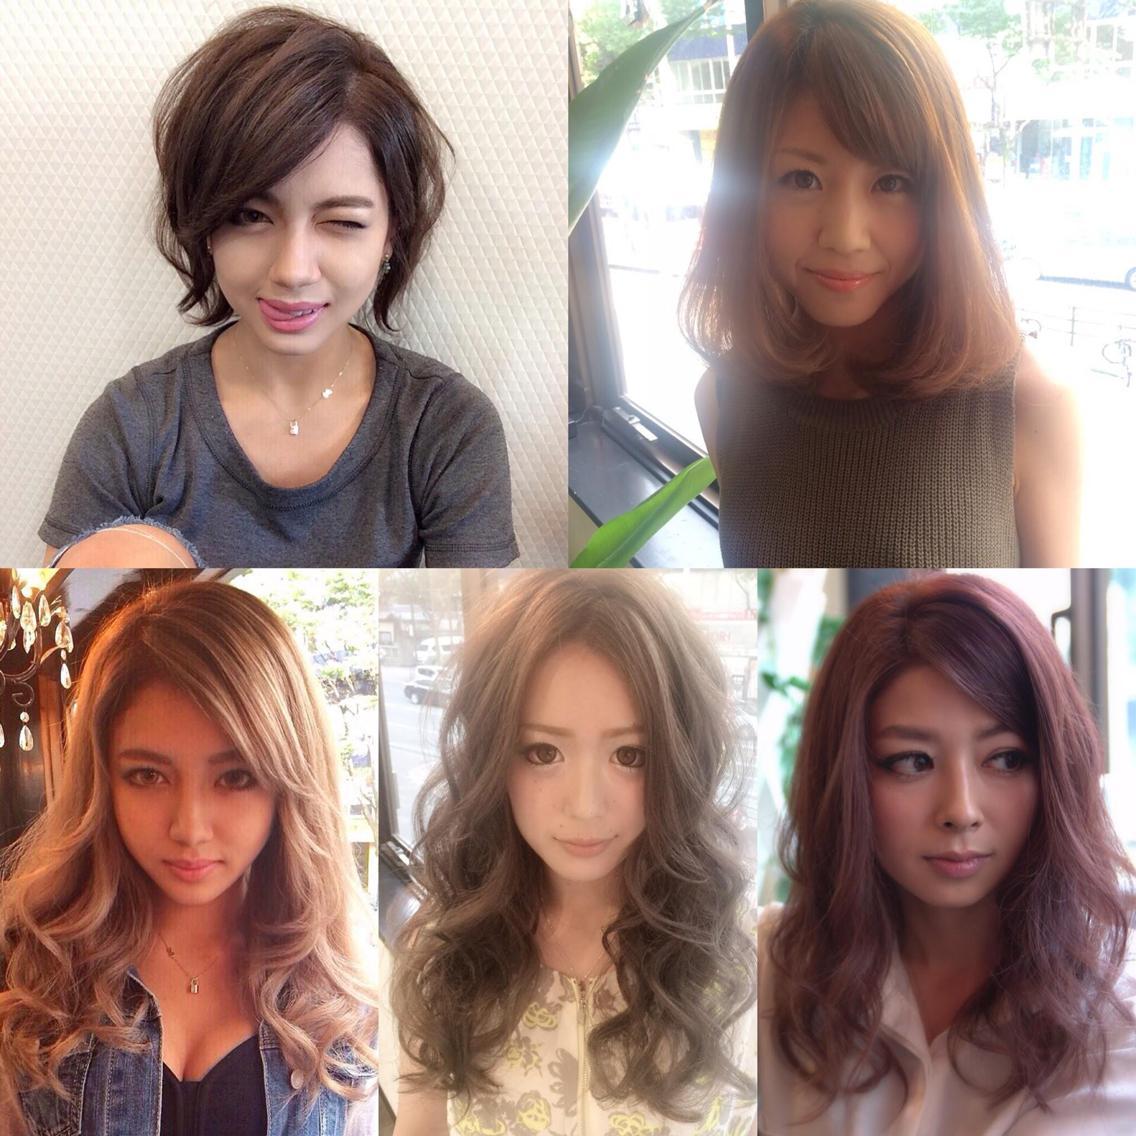 Vida creative hair salon所属・Vida creativeの掲載